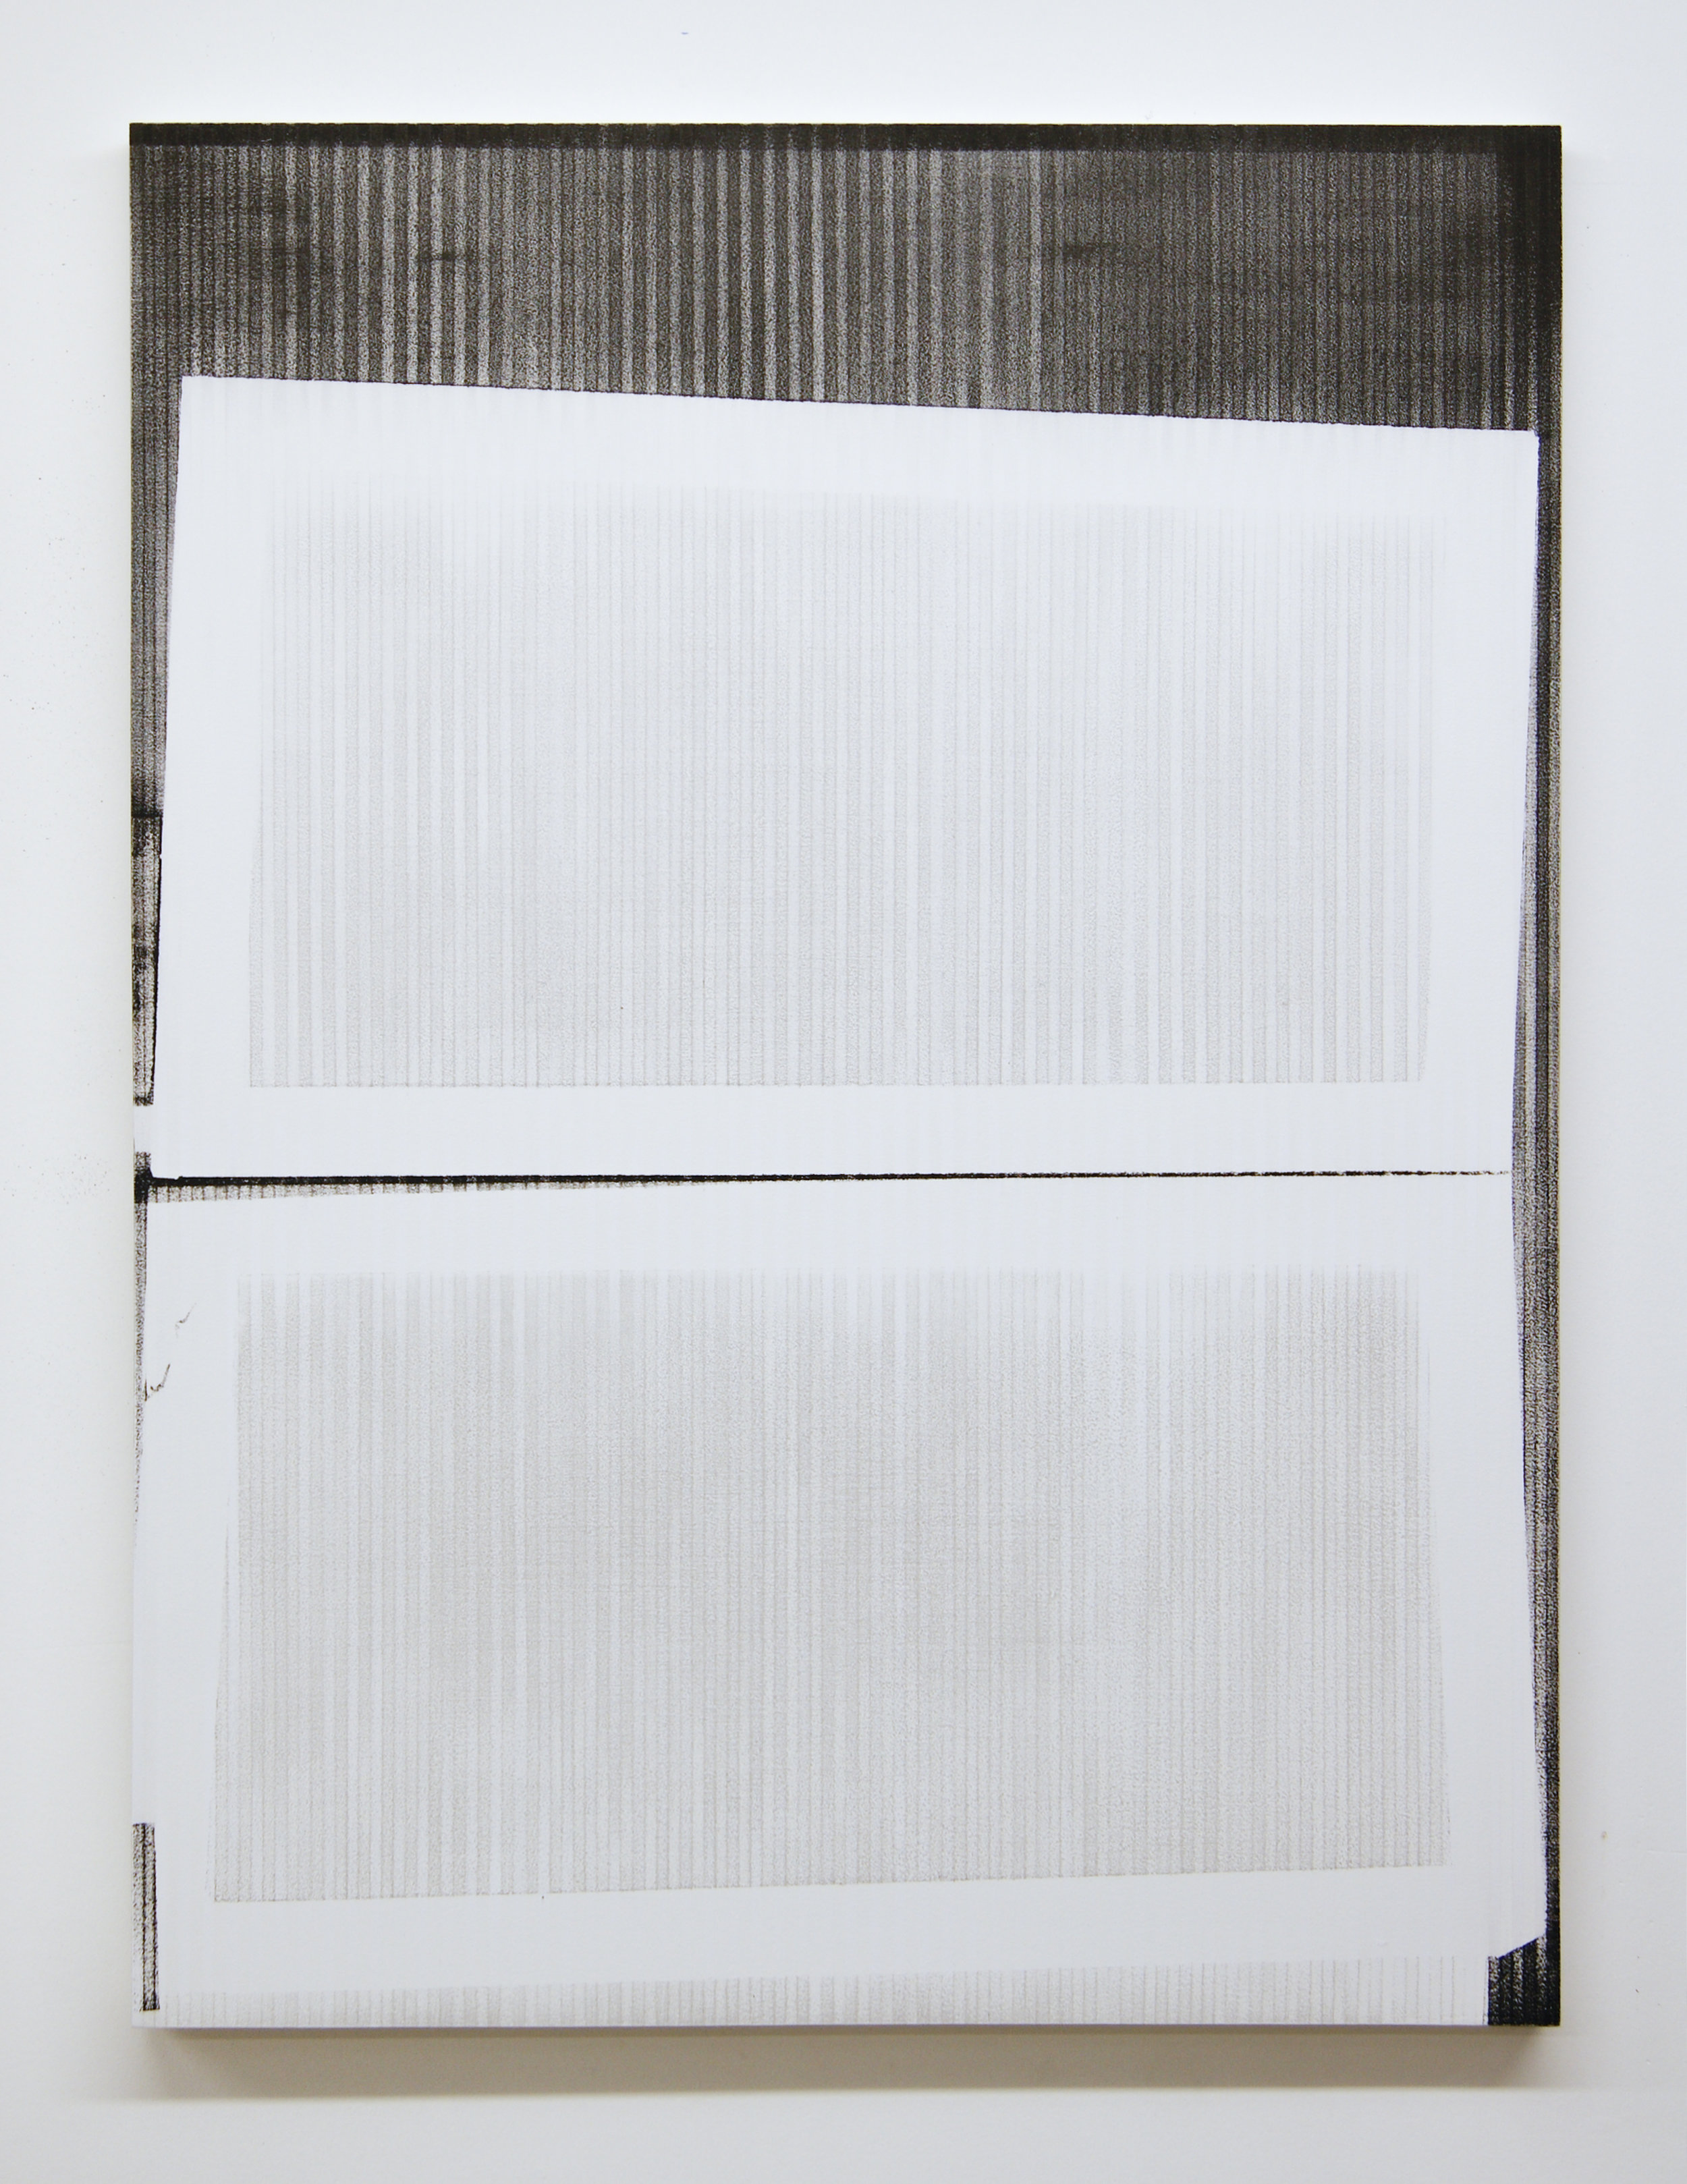 PHG2021, 2015  Acrylic on panel, 40 x 30 inches